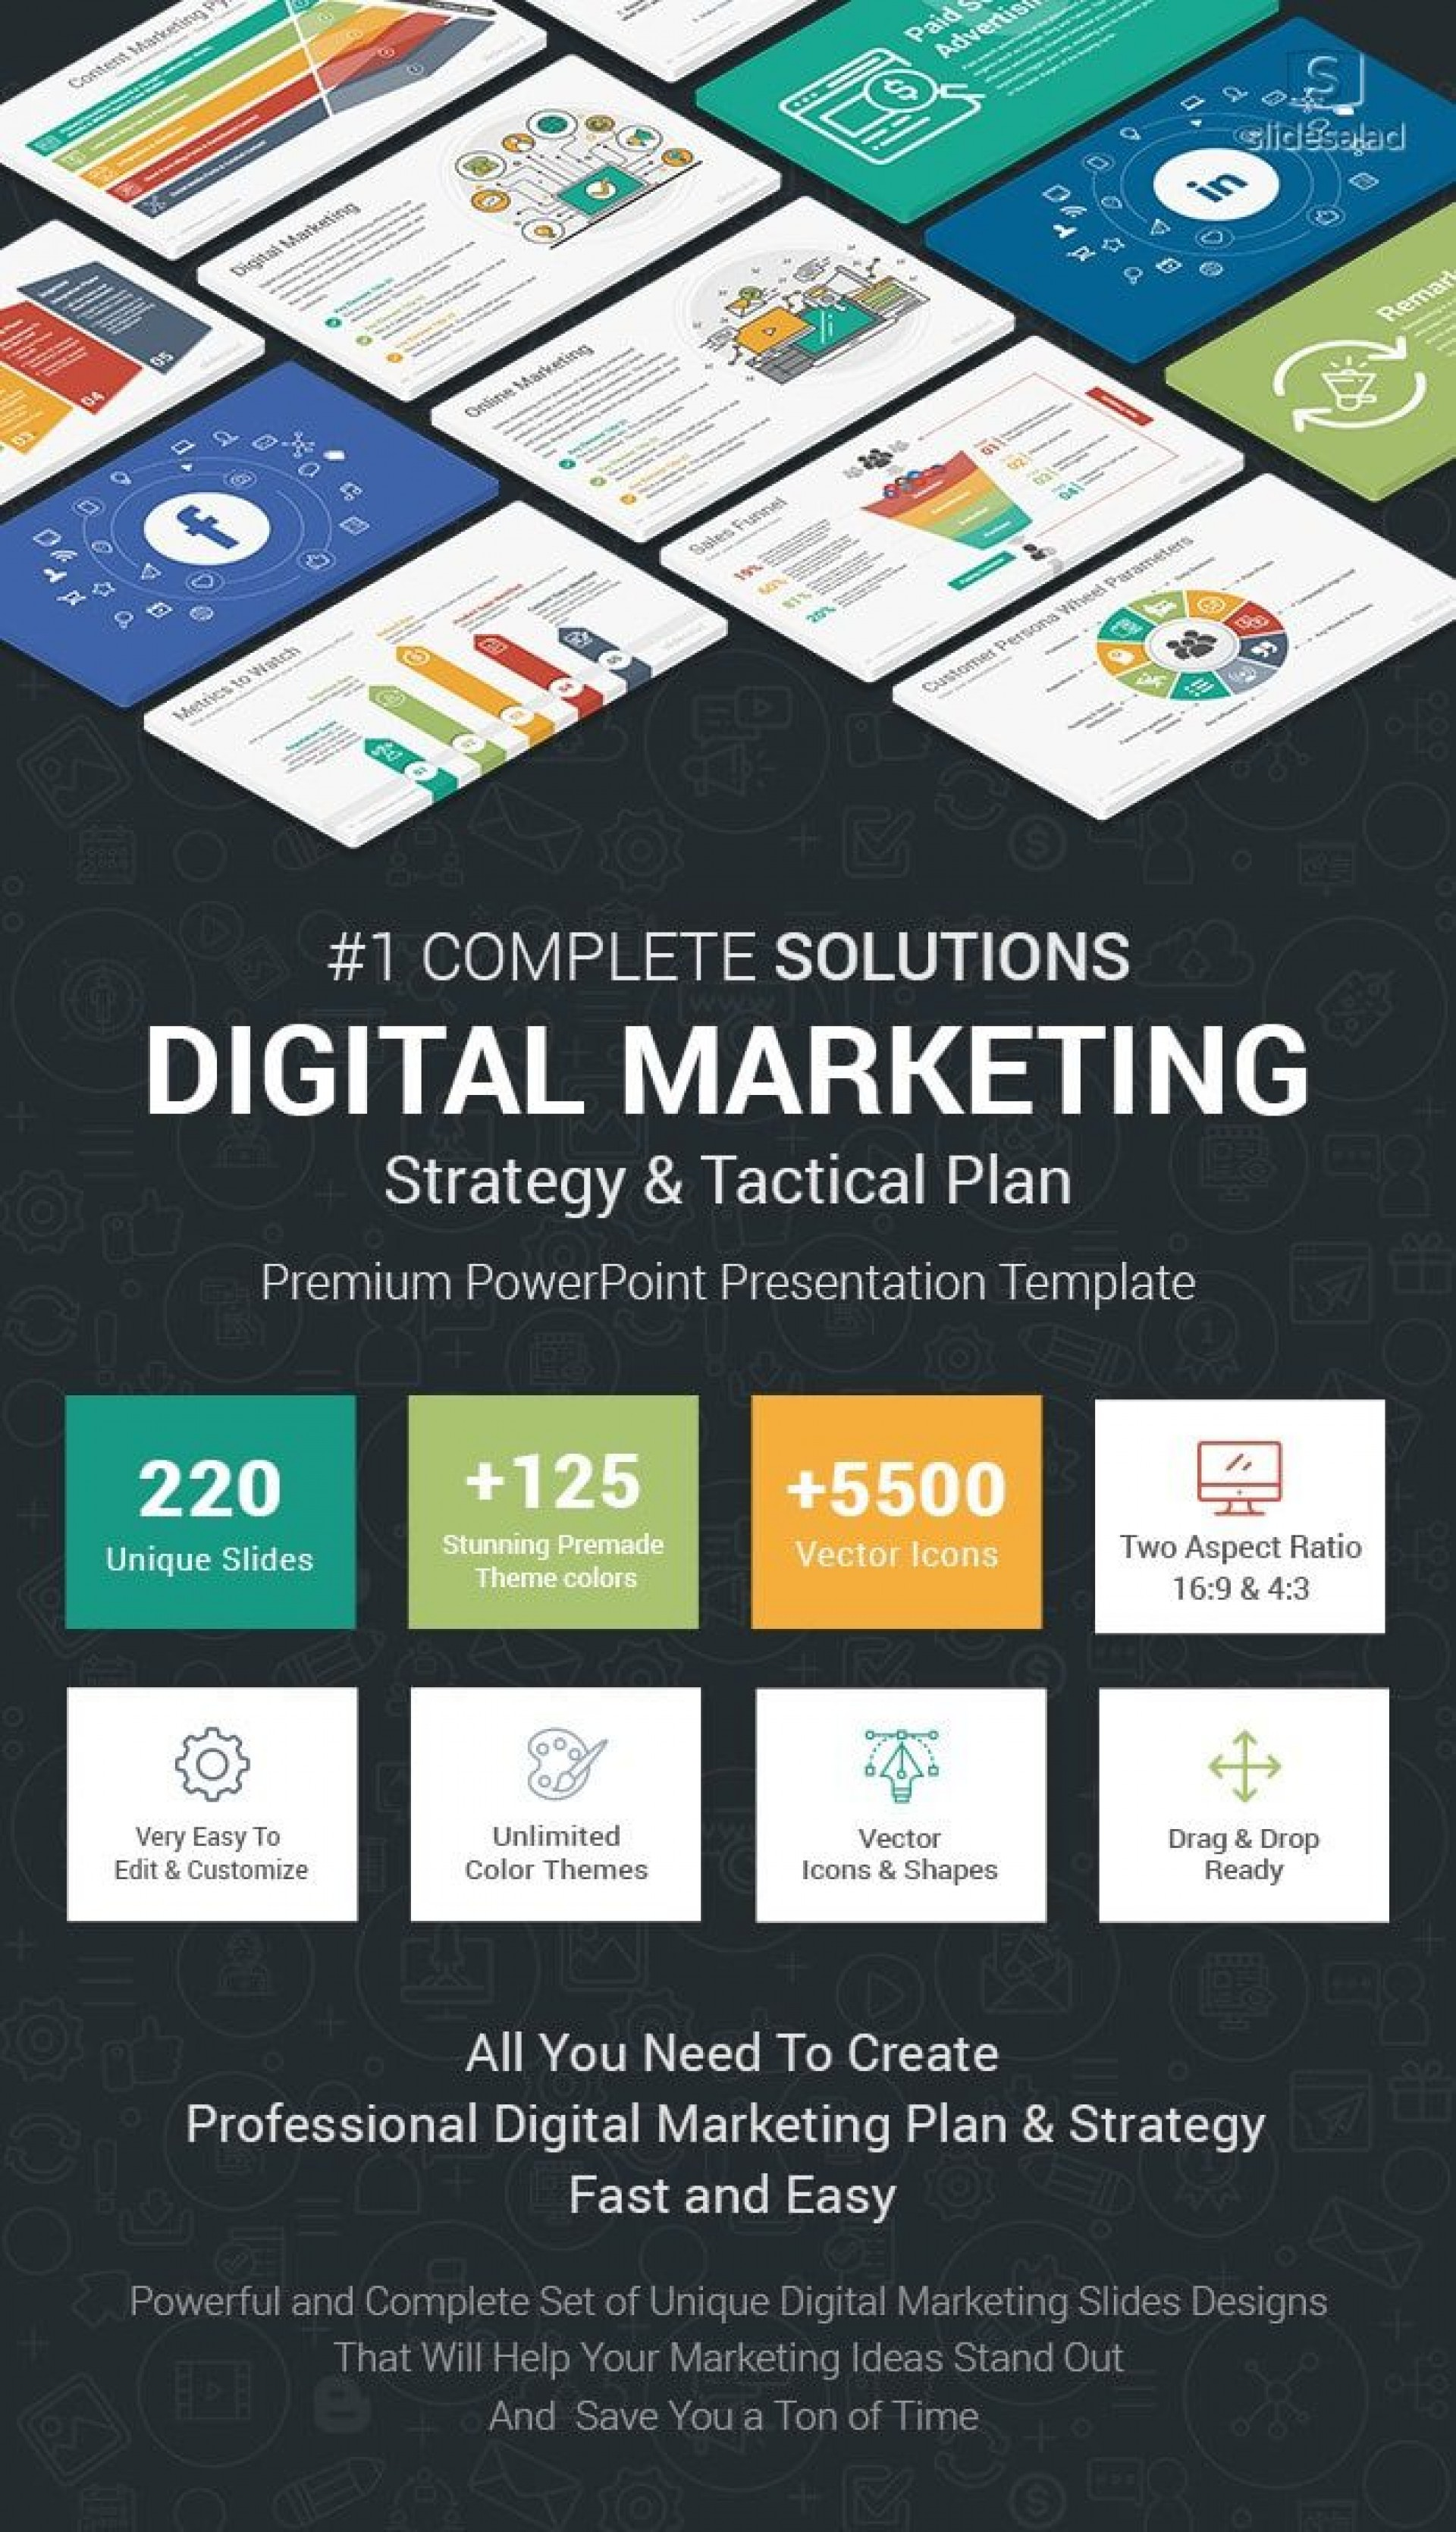 005 Wondrou Digital Marketing Plan Ppt Presentation Concept 1920